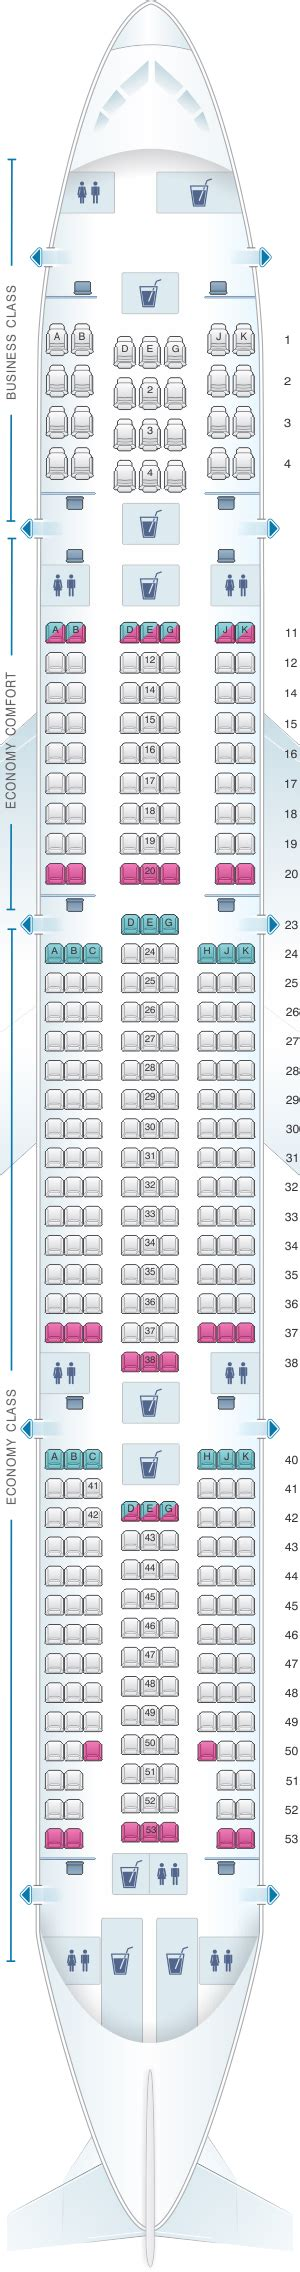 plan si鑒es boeing 777 300er air seat map airlines boeing b777 300er seatmaestro com